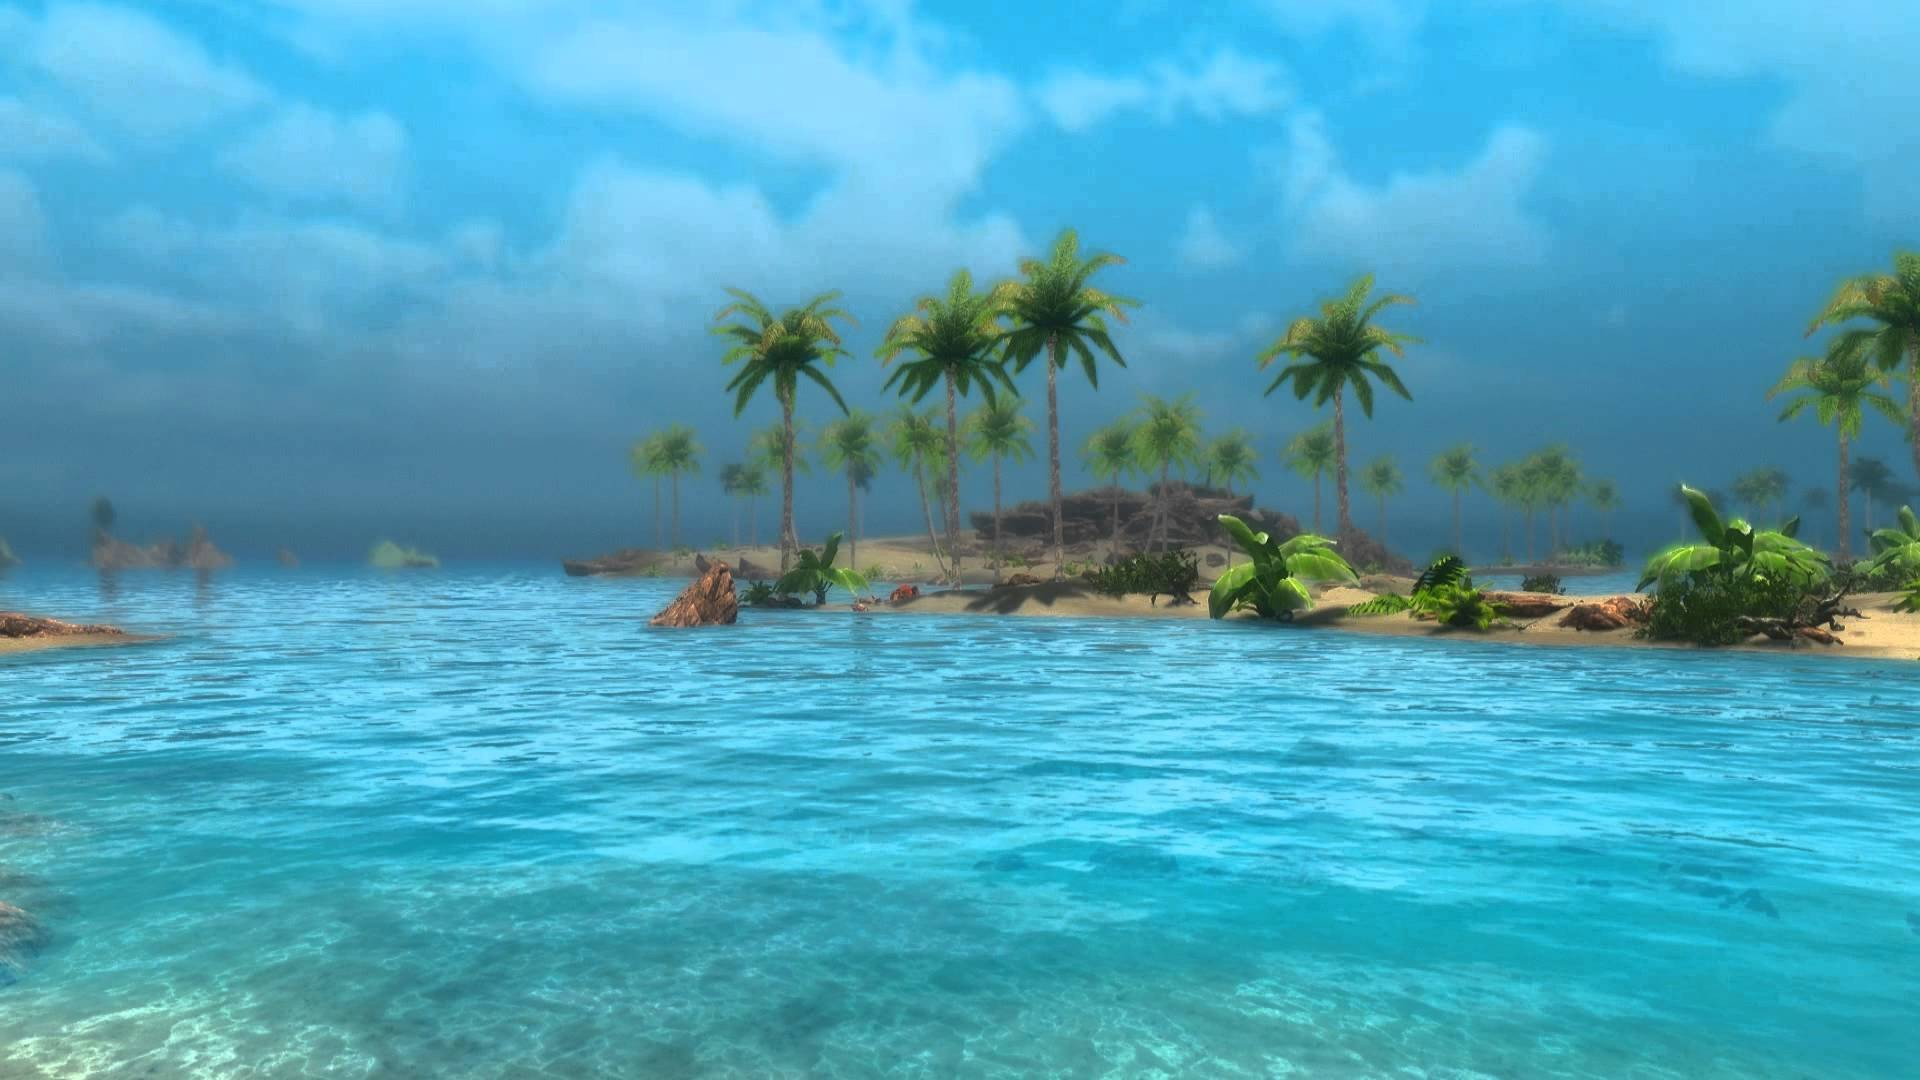 35 Desktop Backgrounds Beach Download Free Beautiful